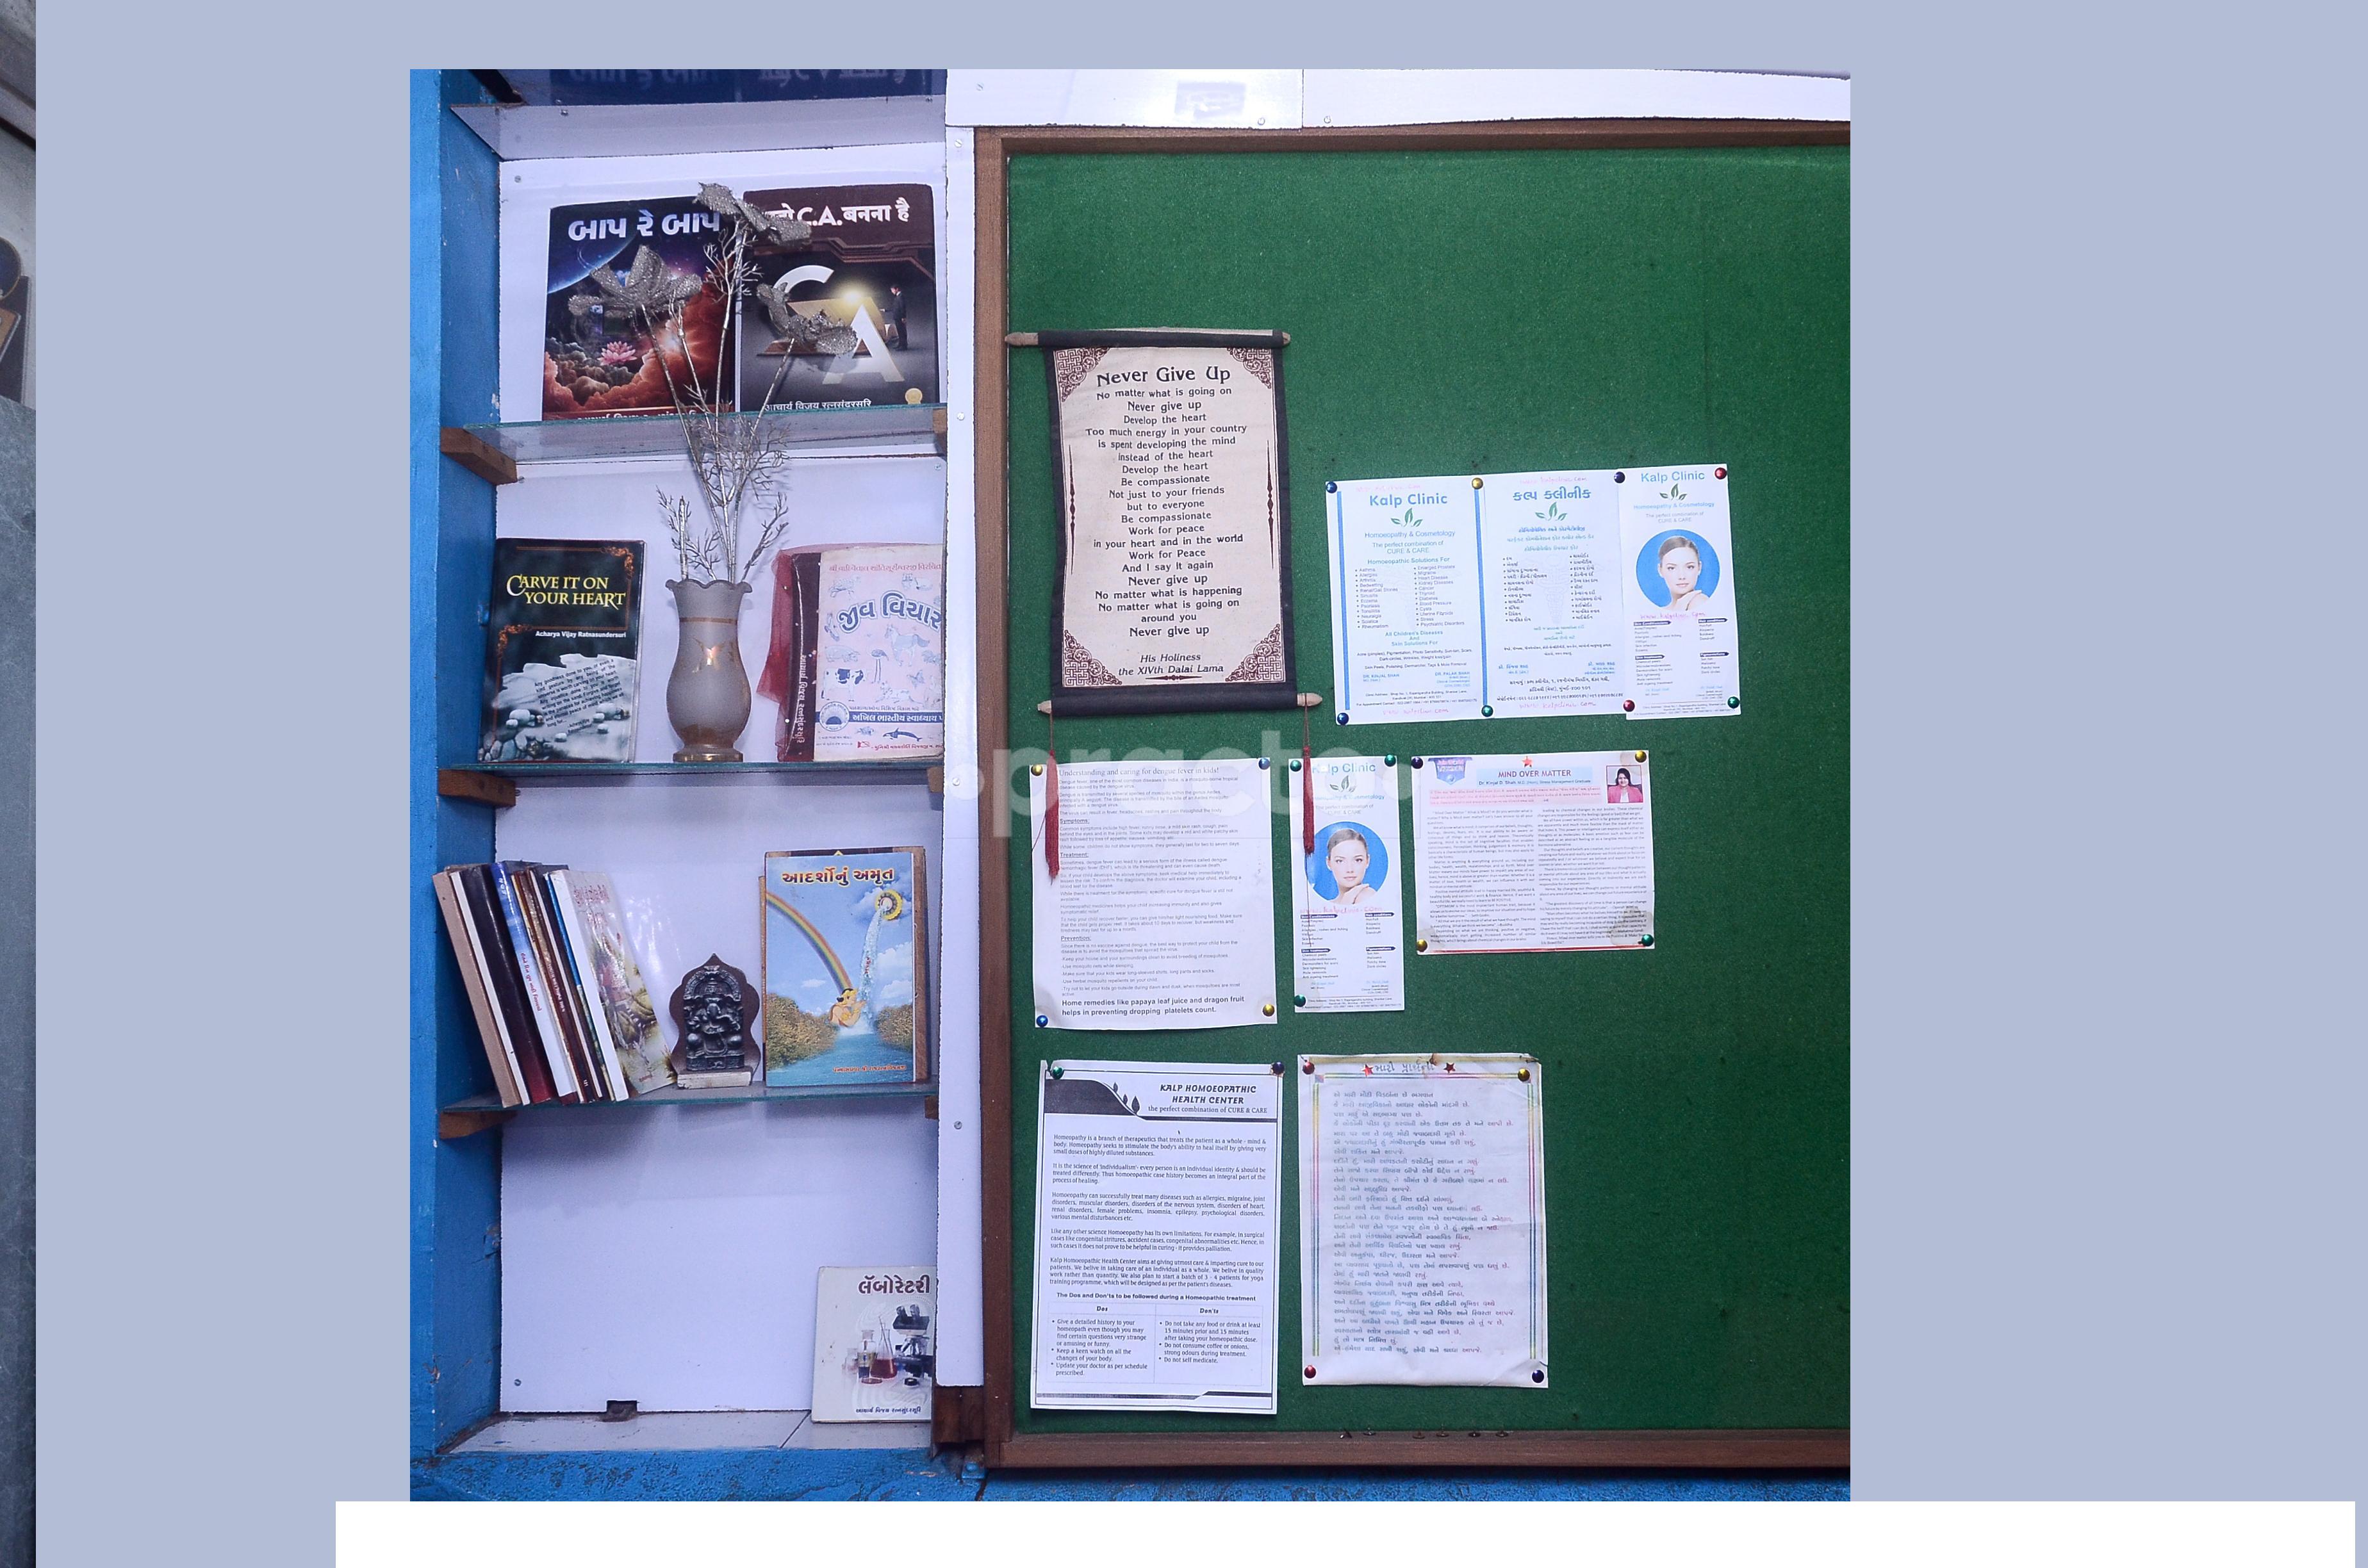 Best Homoeopathy Clinics in Malad West, Mumbai - Book